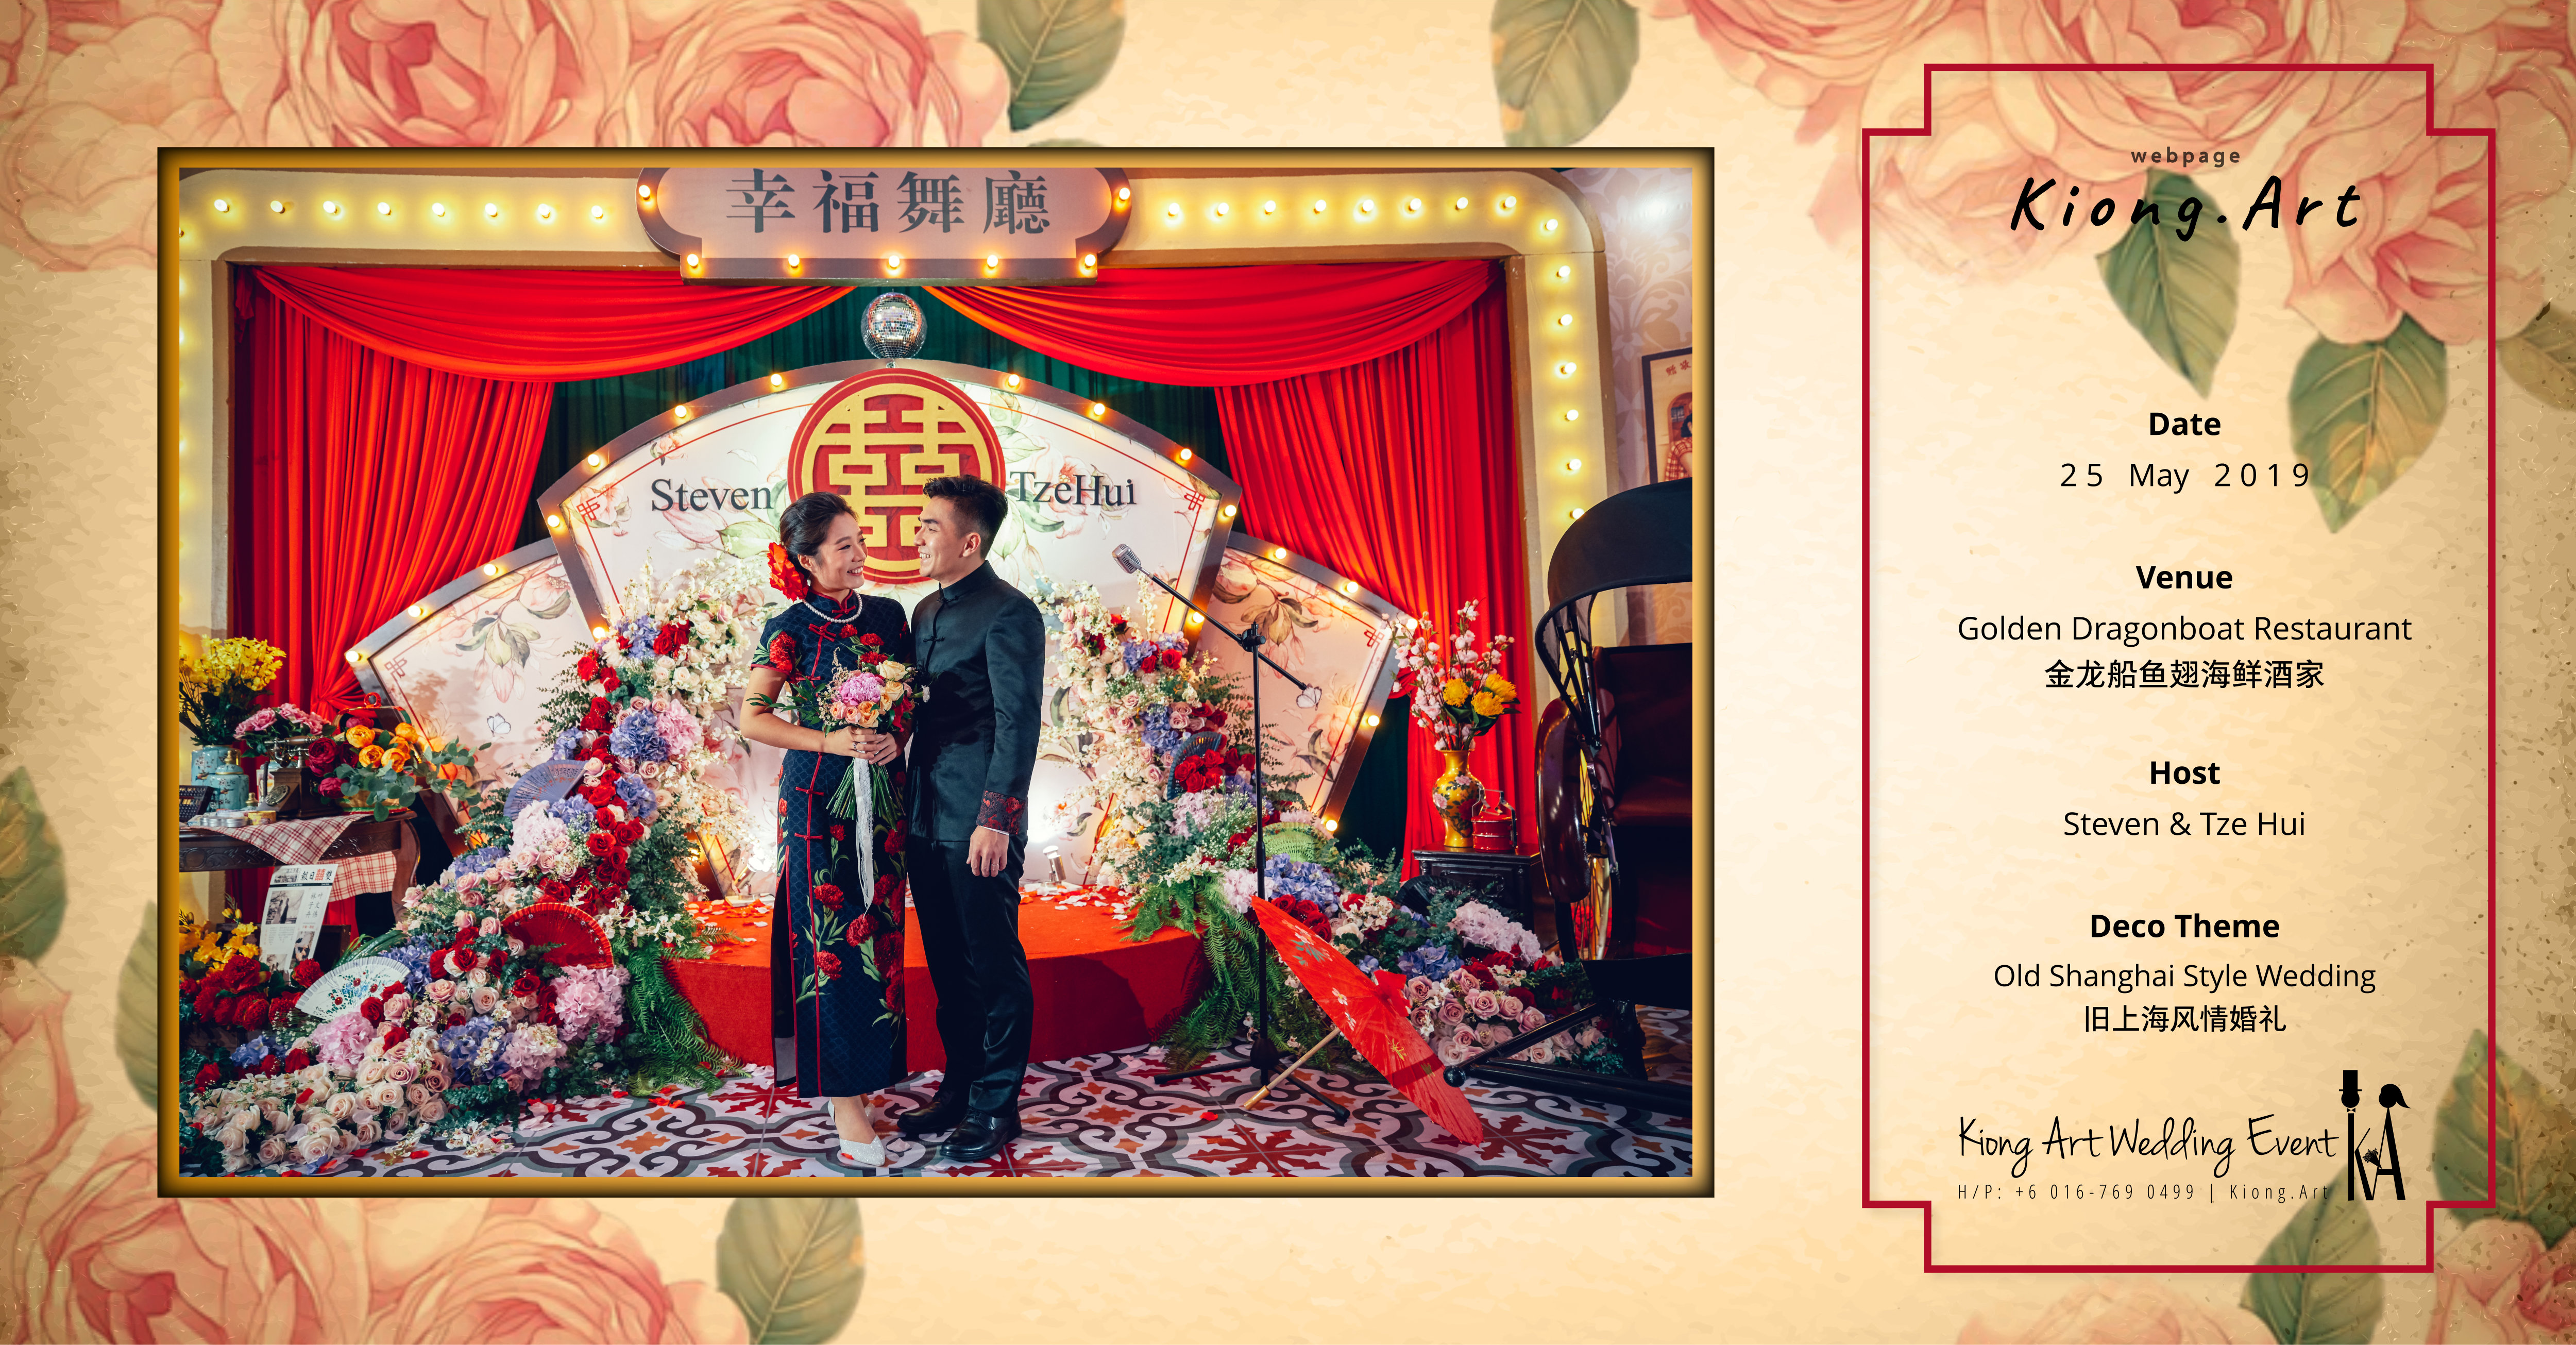 Kuala Lumpur Wedding Deco Decoration Kiong Art Wedding Deco Old Shanghai Style Wedding 旧上海风情婚礼 Steven and Tze Hui at Golden Dragonboat Restaurant 金龙船鱼翅海鲜酒家 Malaysia A16-B00-011